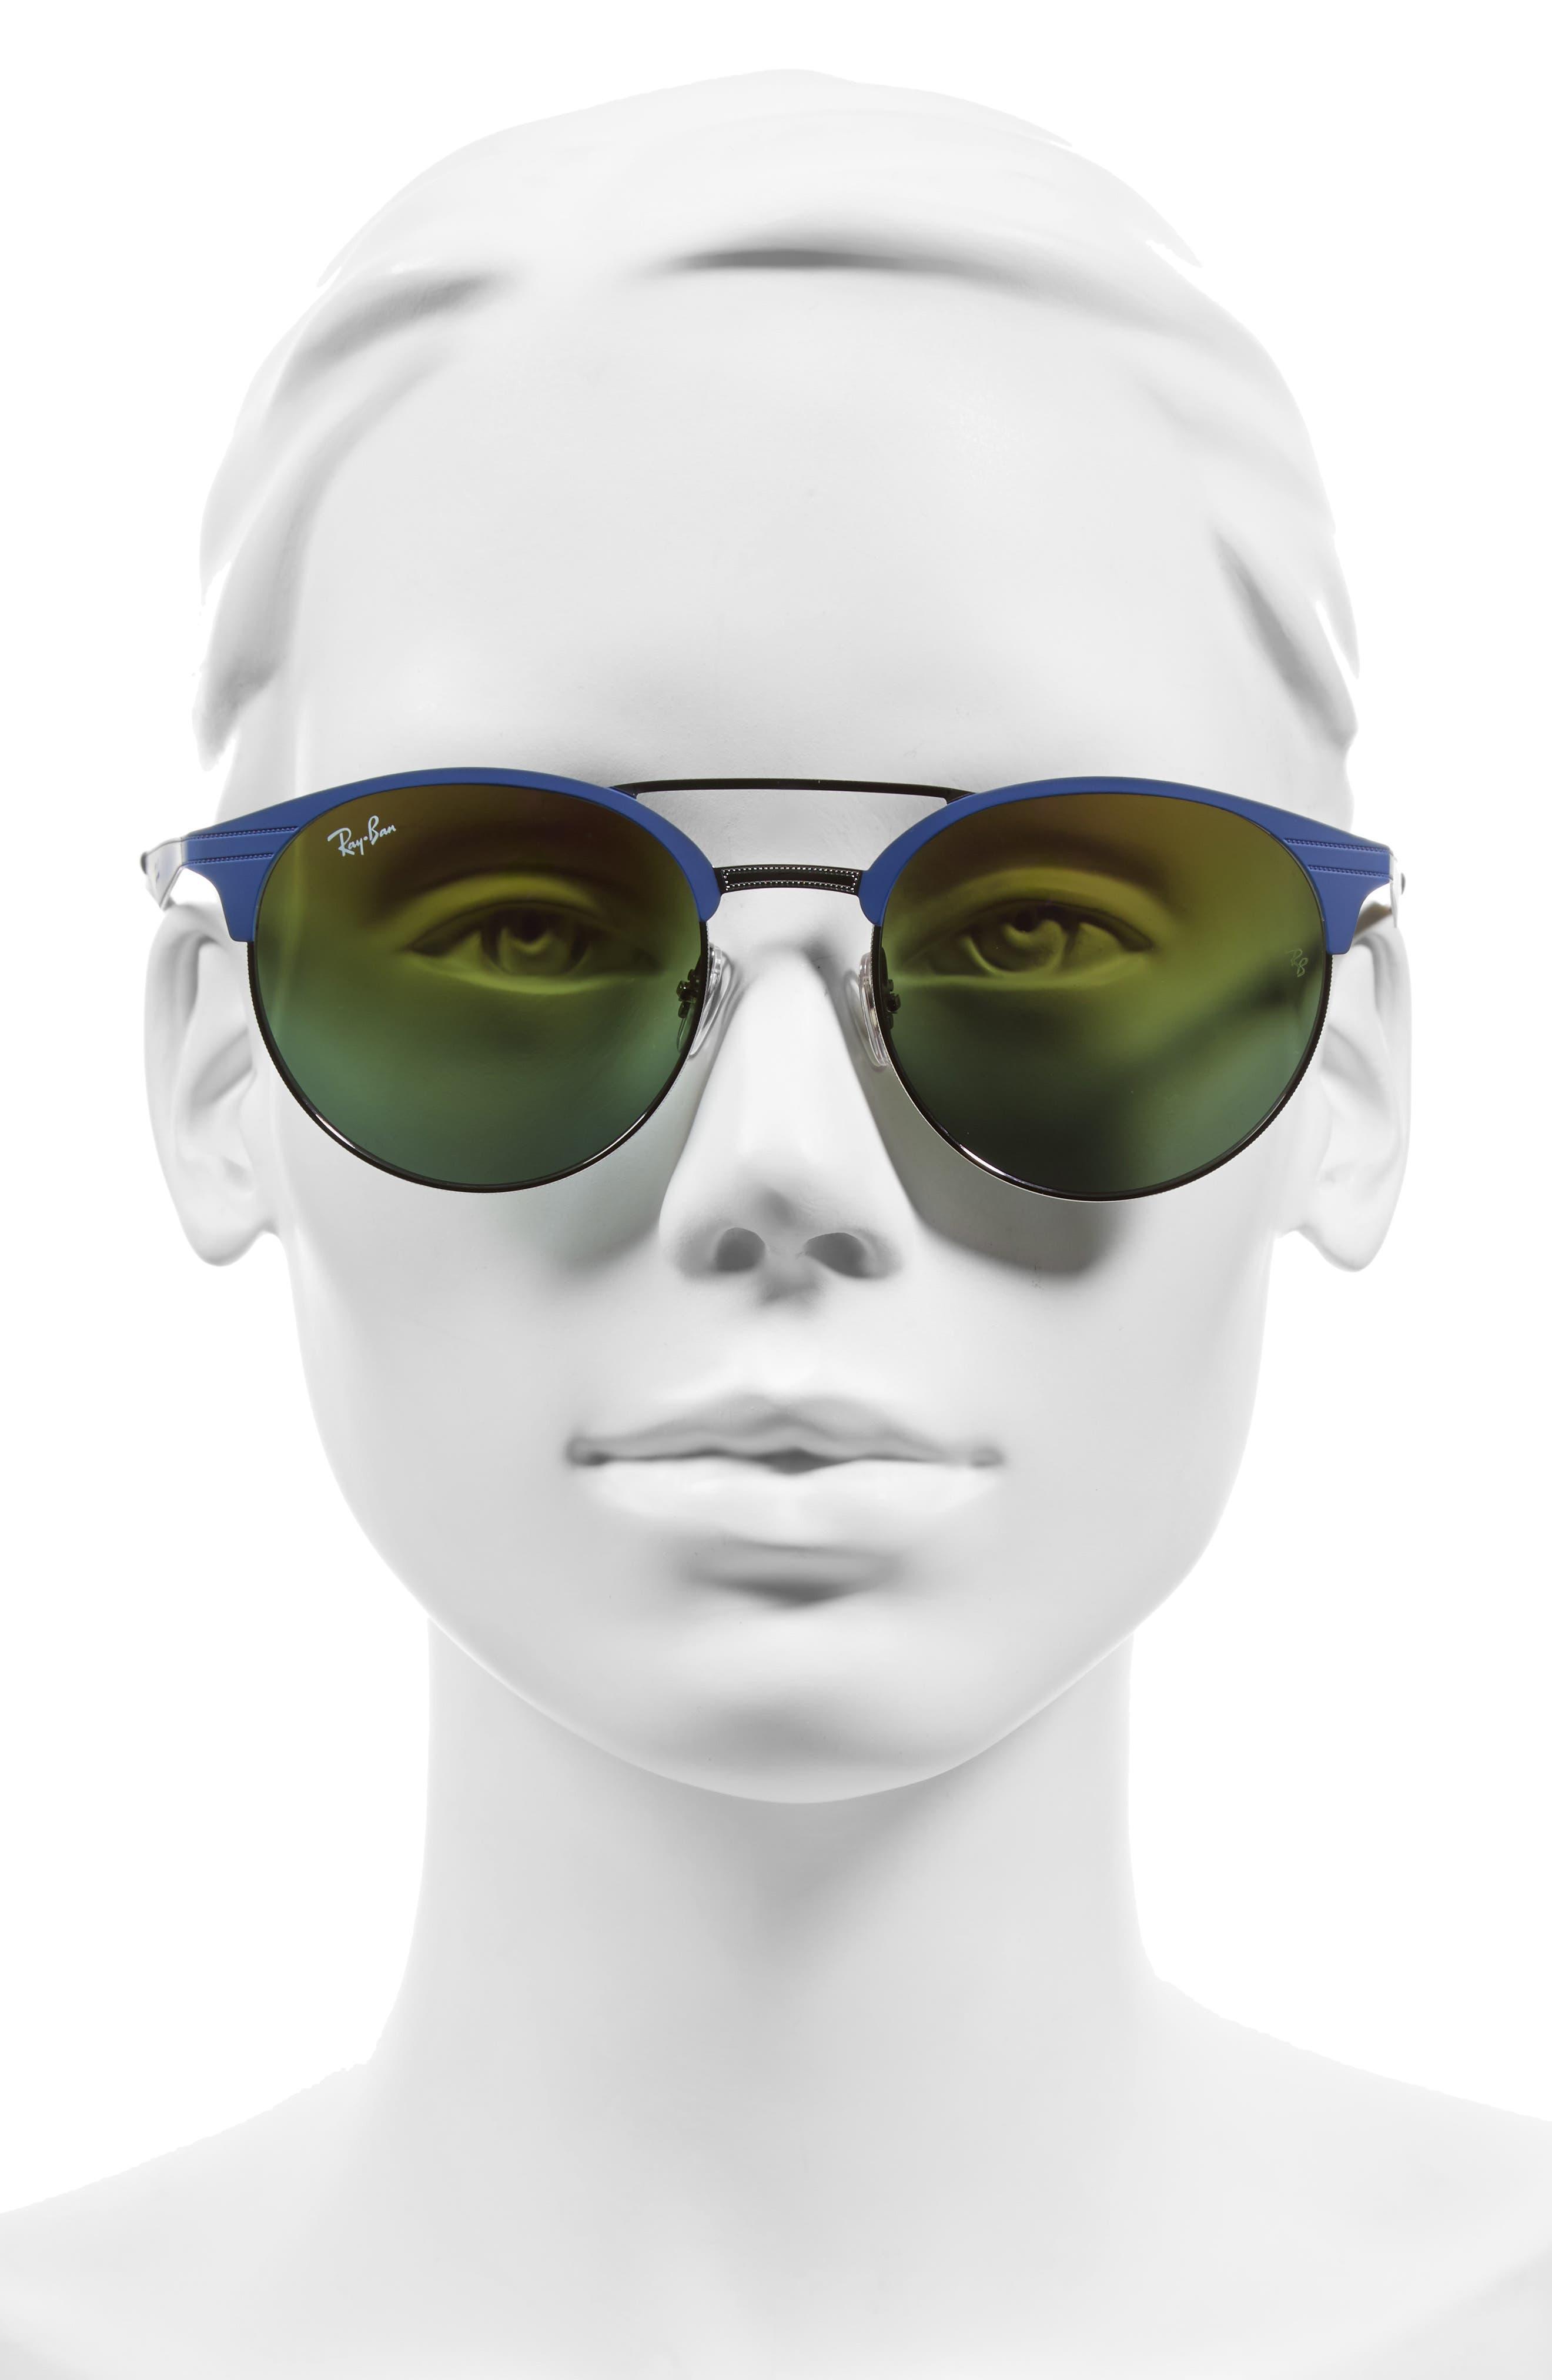 Highstreet 54mm Round Sunglasses,                             Alternate thumbnail 2, color,                             Black/ Blue/ Violet